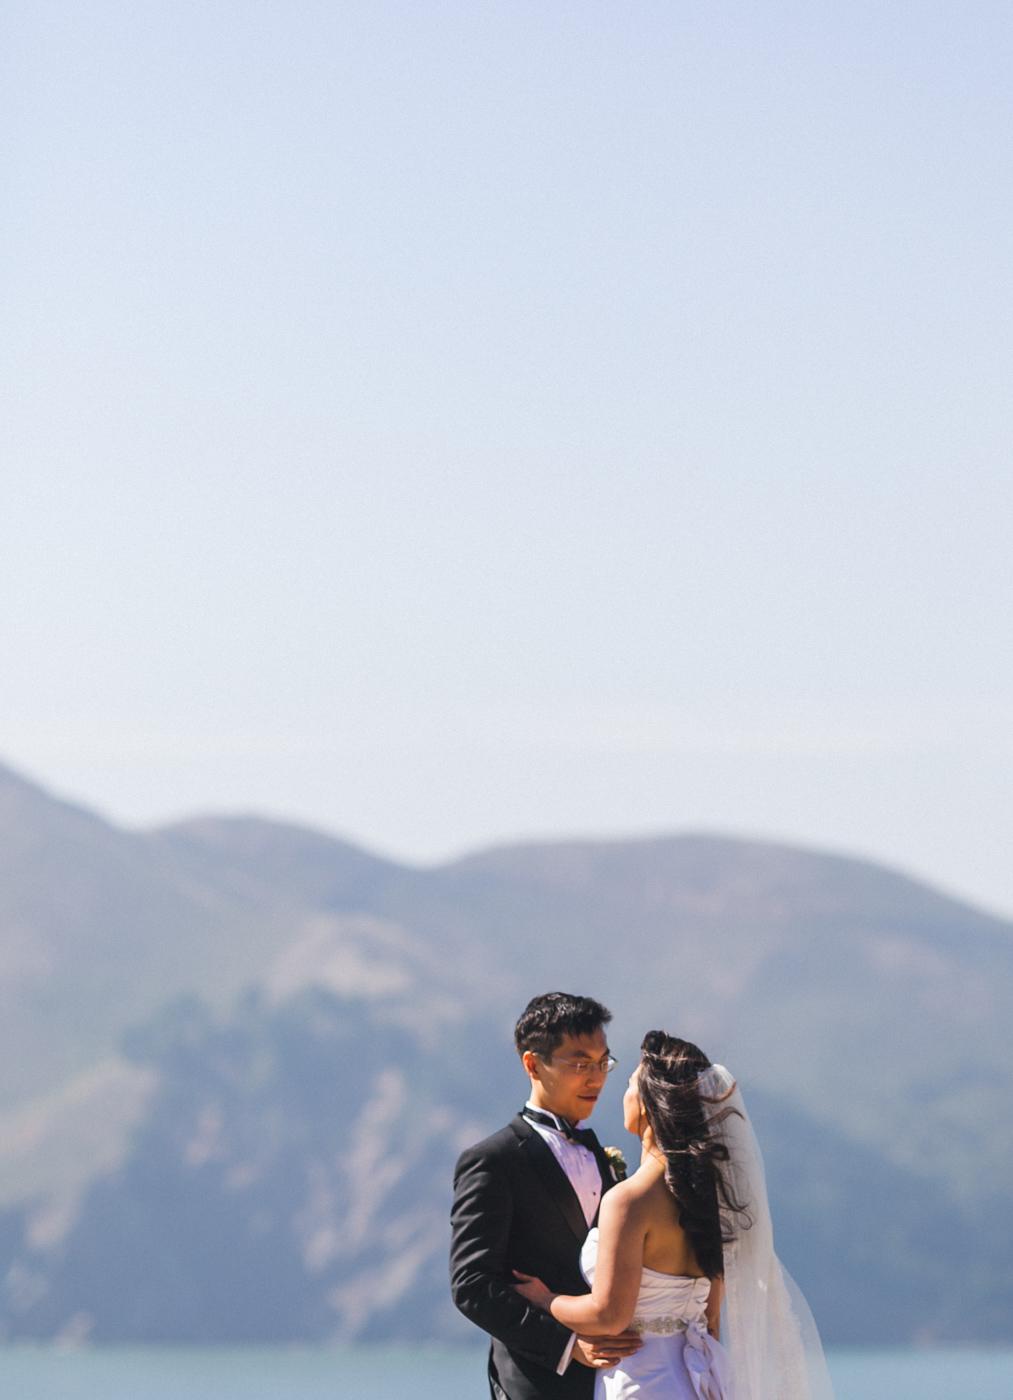 bride-and-groom-wedding-portrait-by-ocean